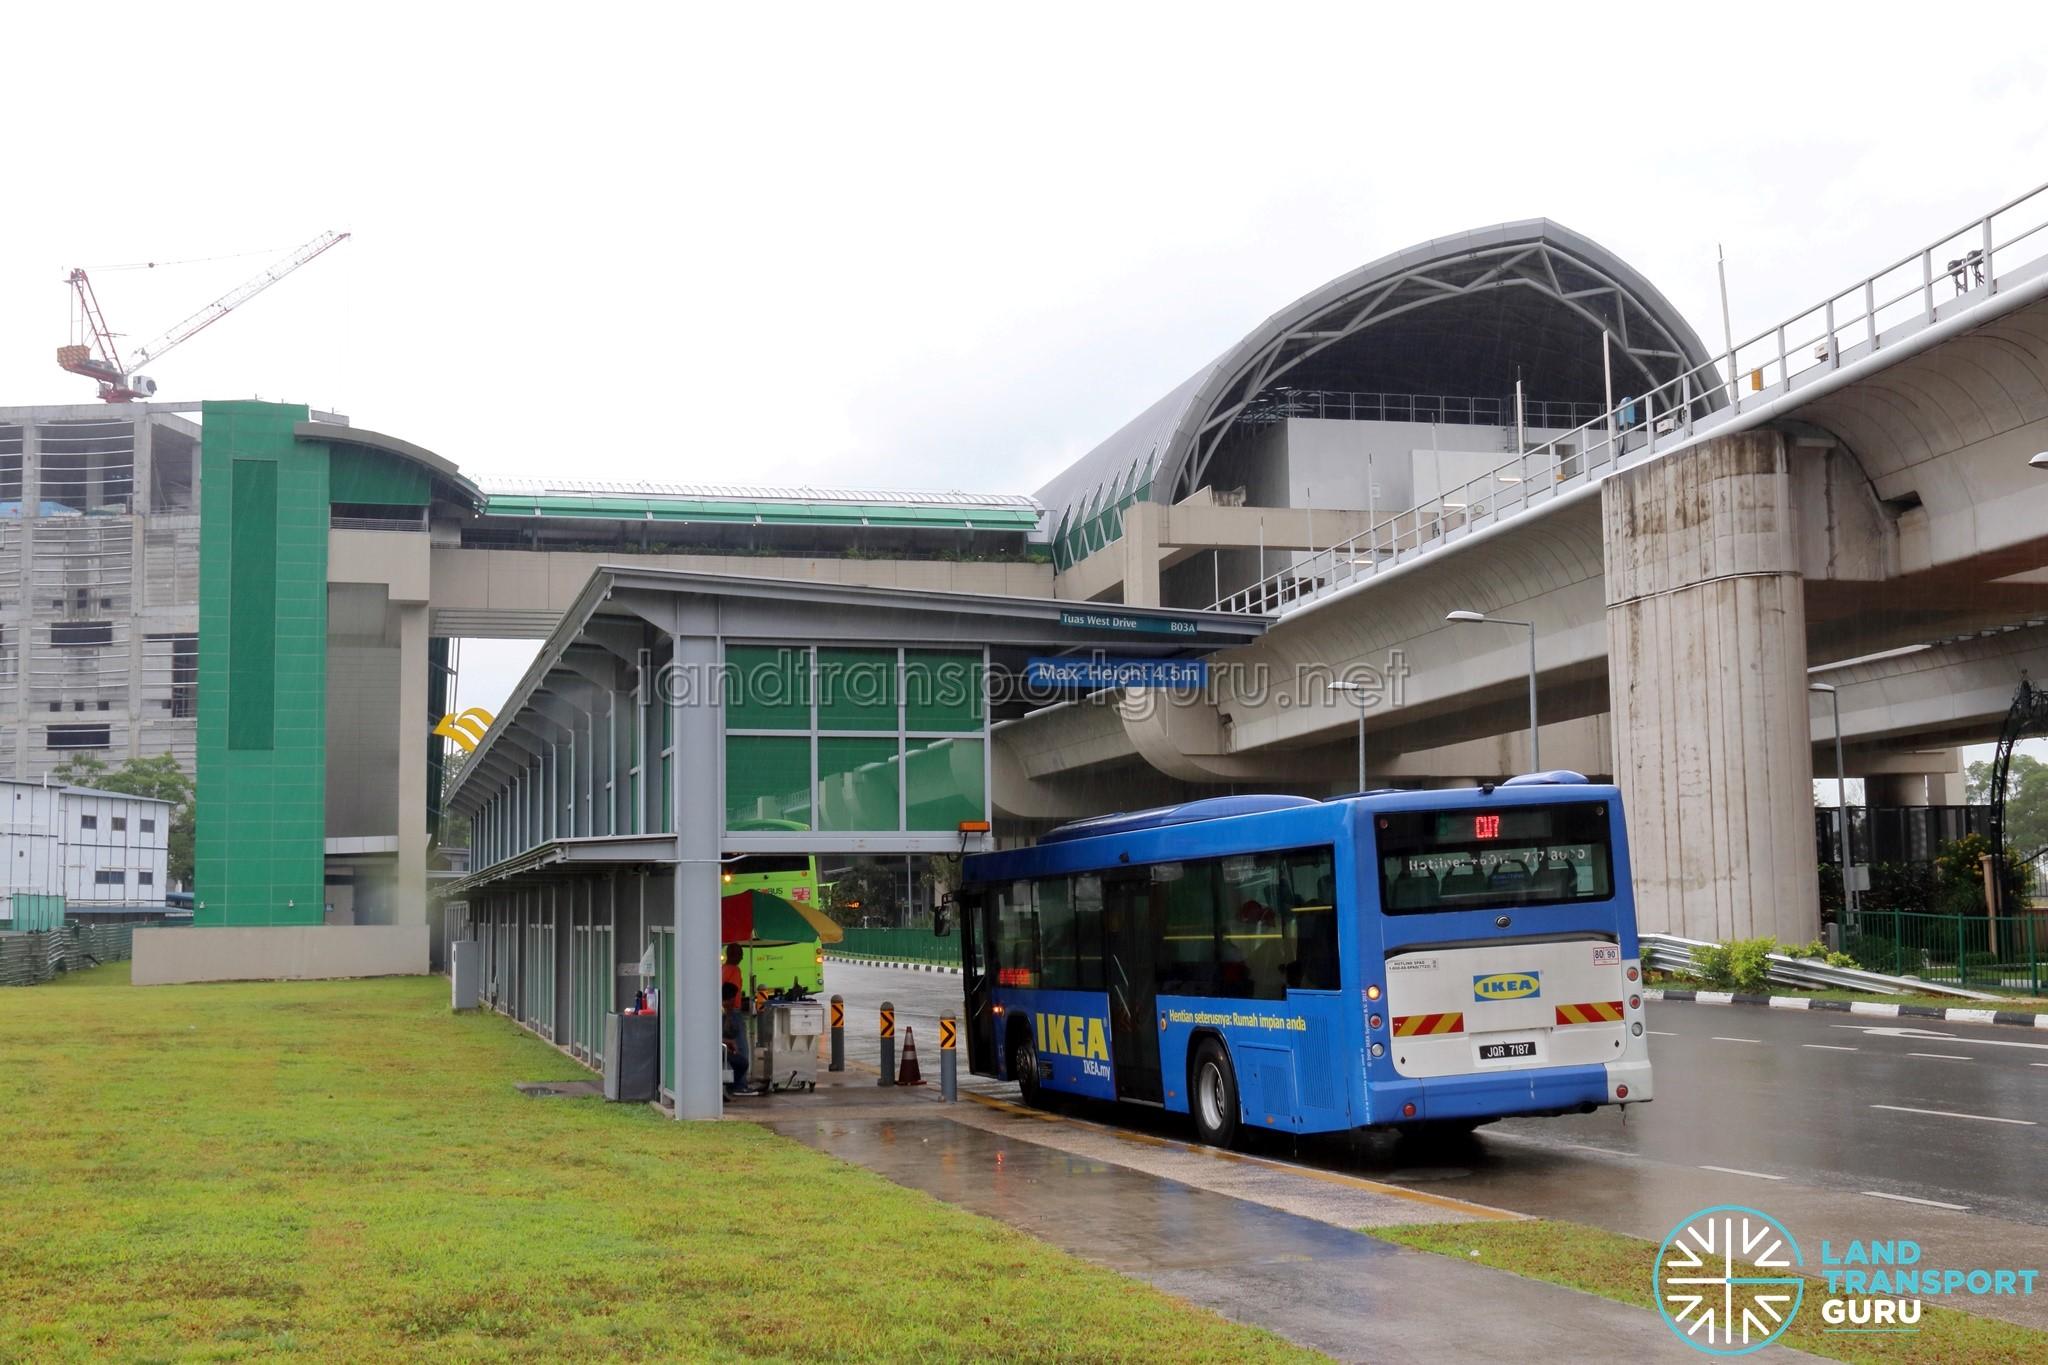 Causeway Link Bus Service CW7 | Land Transport Guru